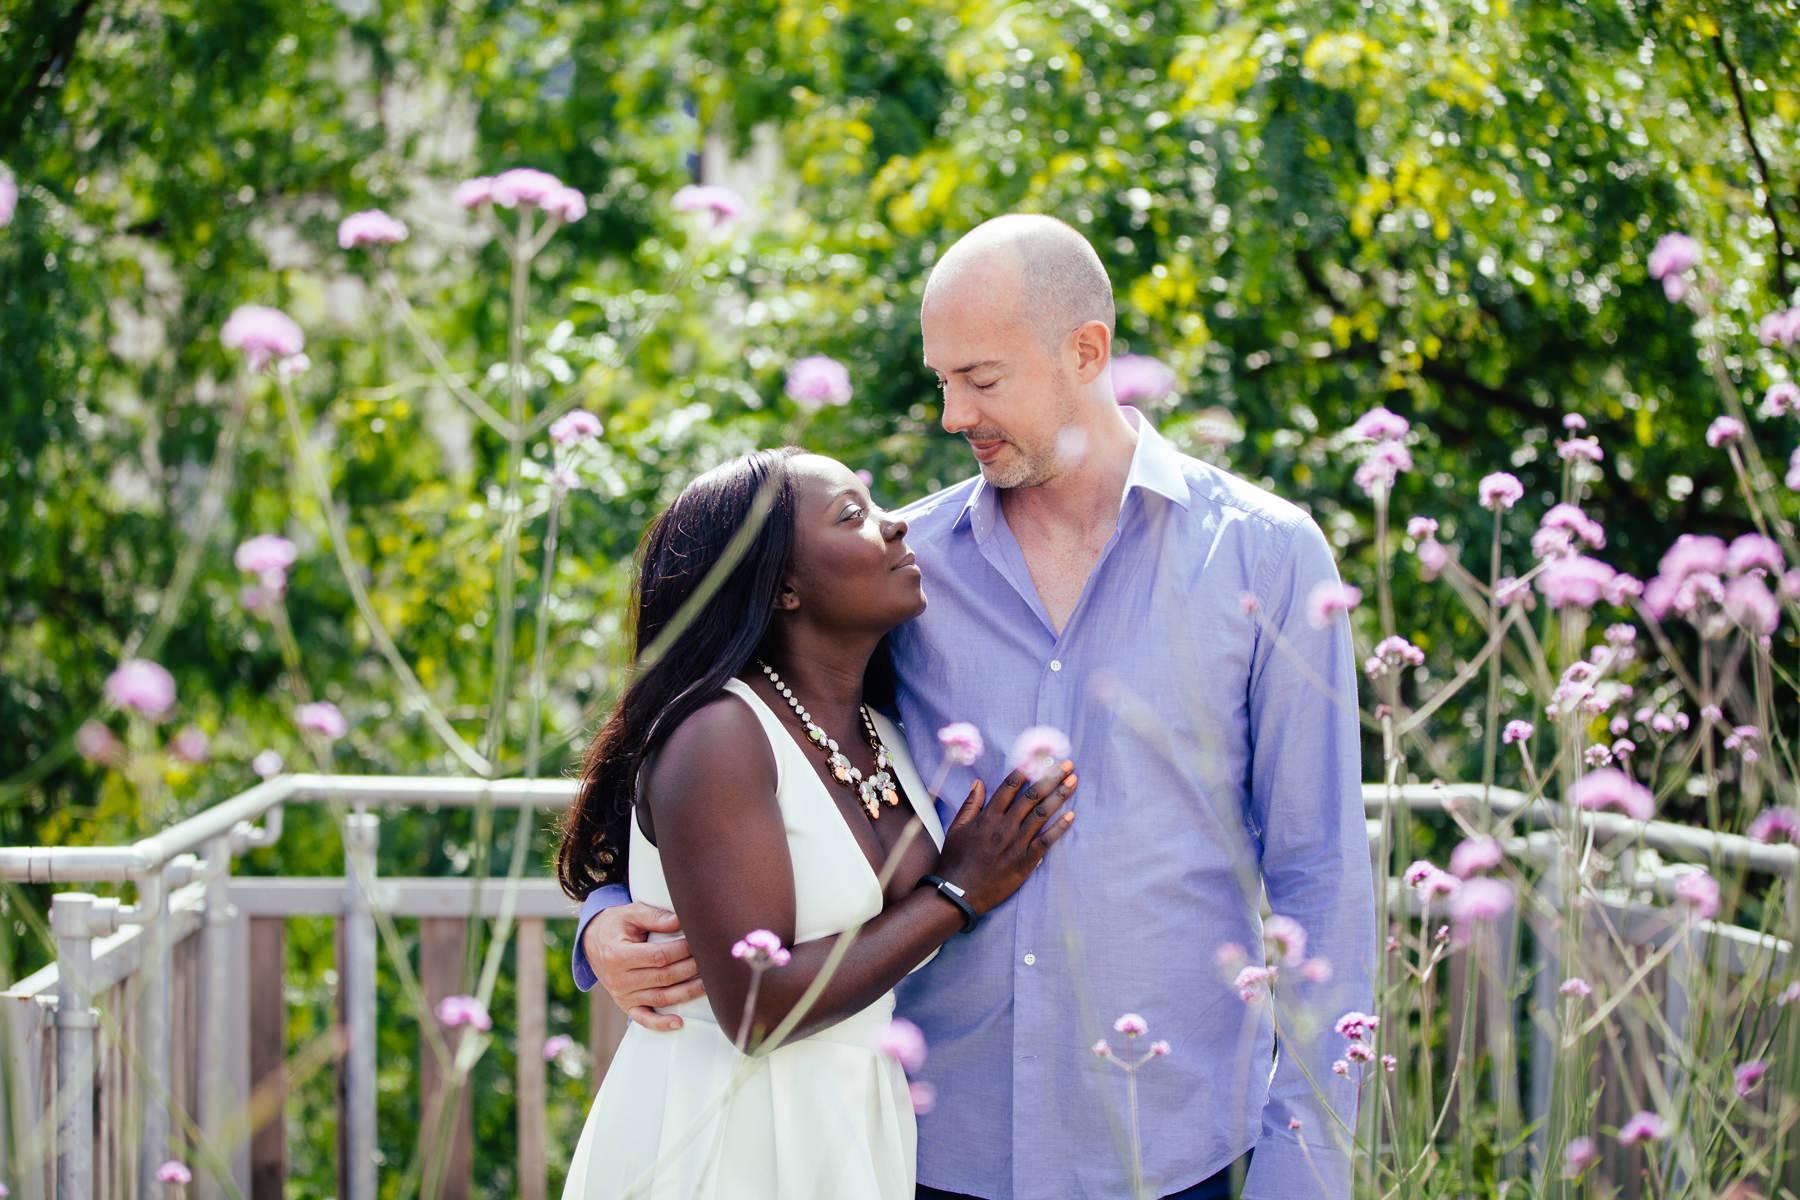 London-Southbank-engagement-photos-couple-embracing-amongst-flowers